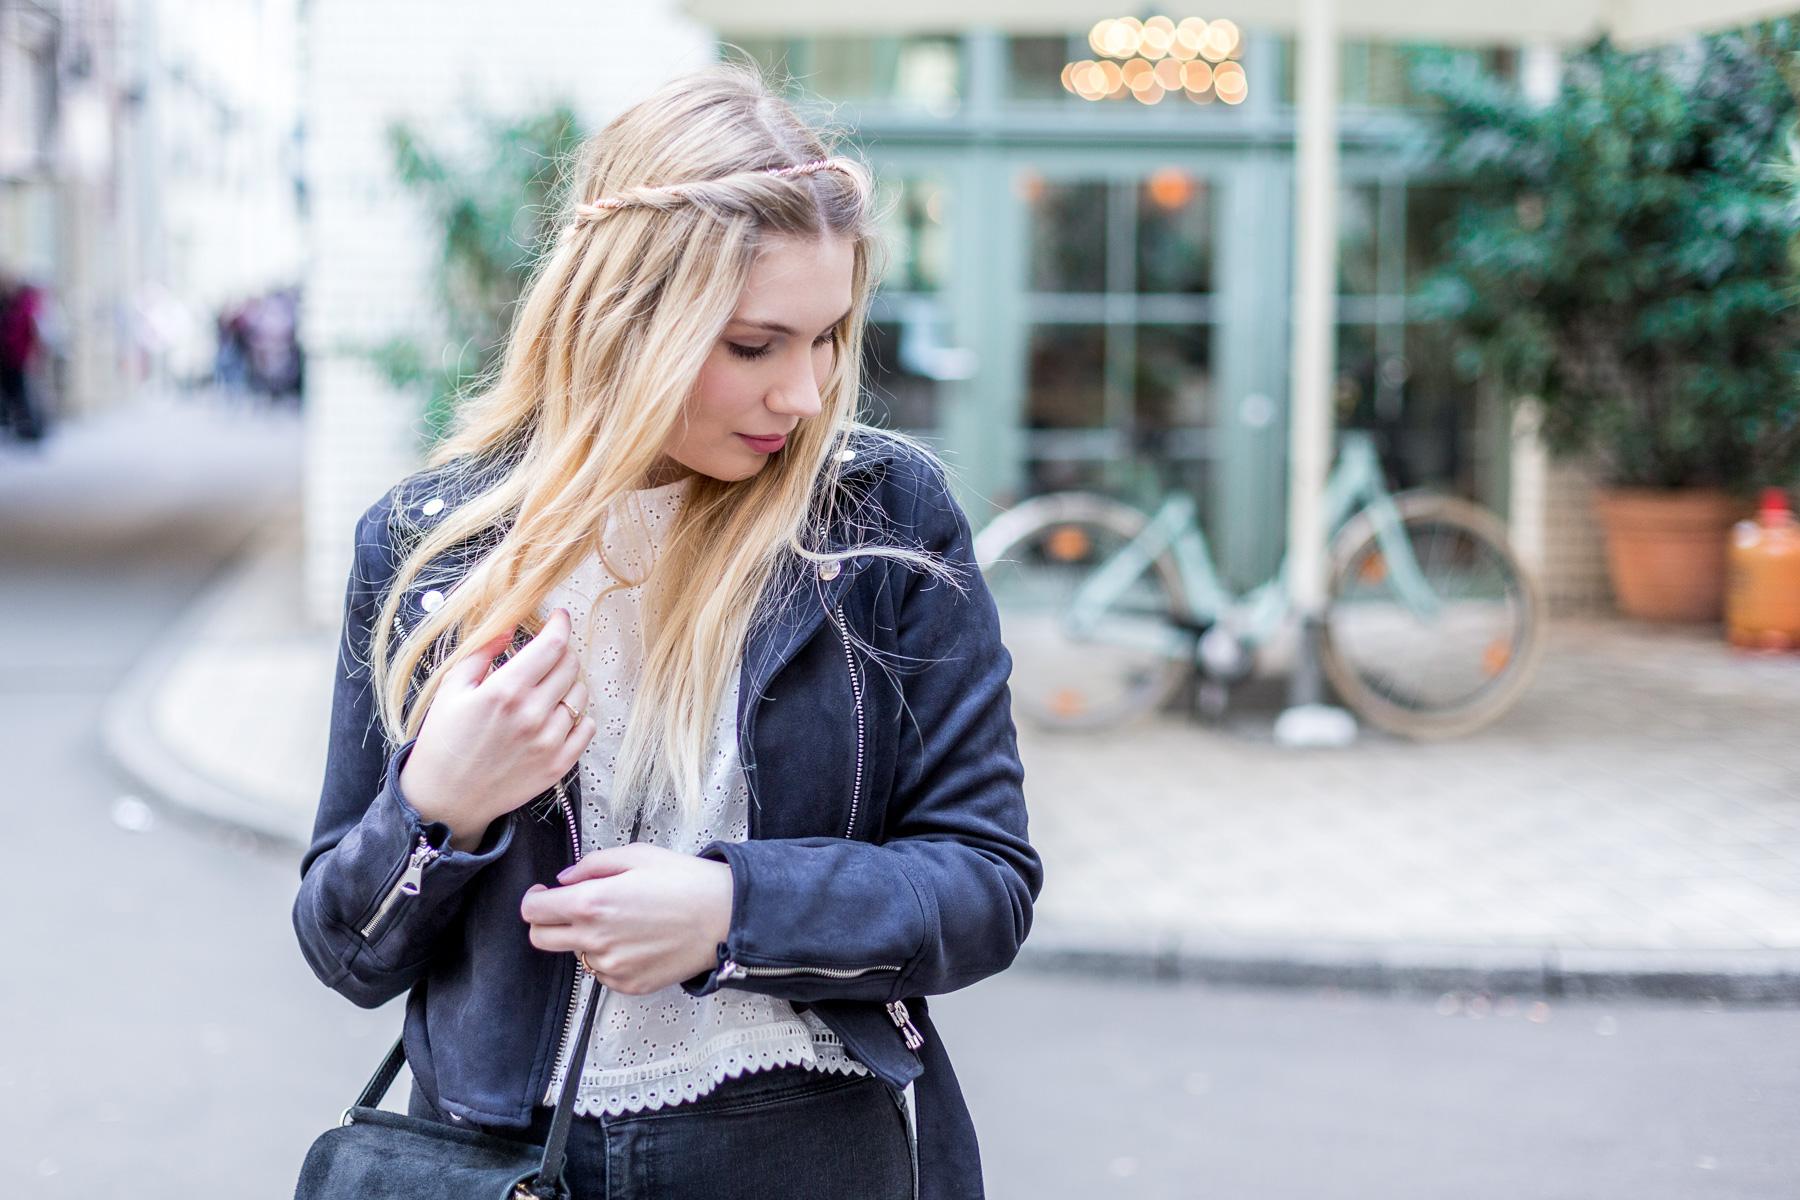 Wiosna 2018 – transparentne bluzki, koronki i hafty